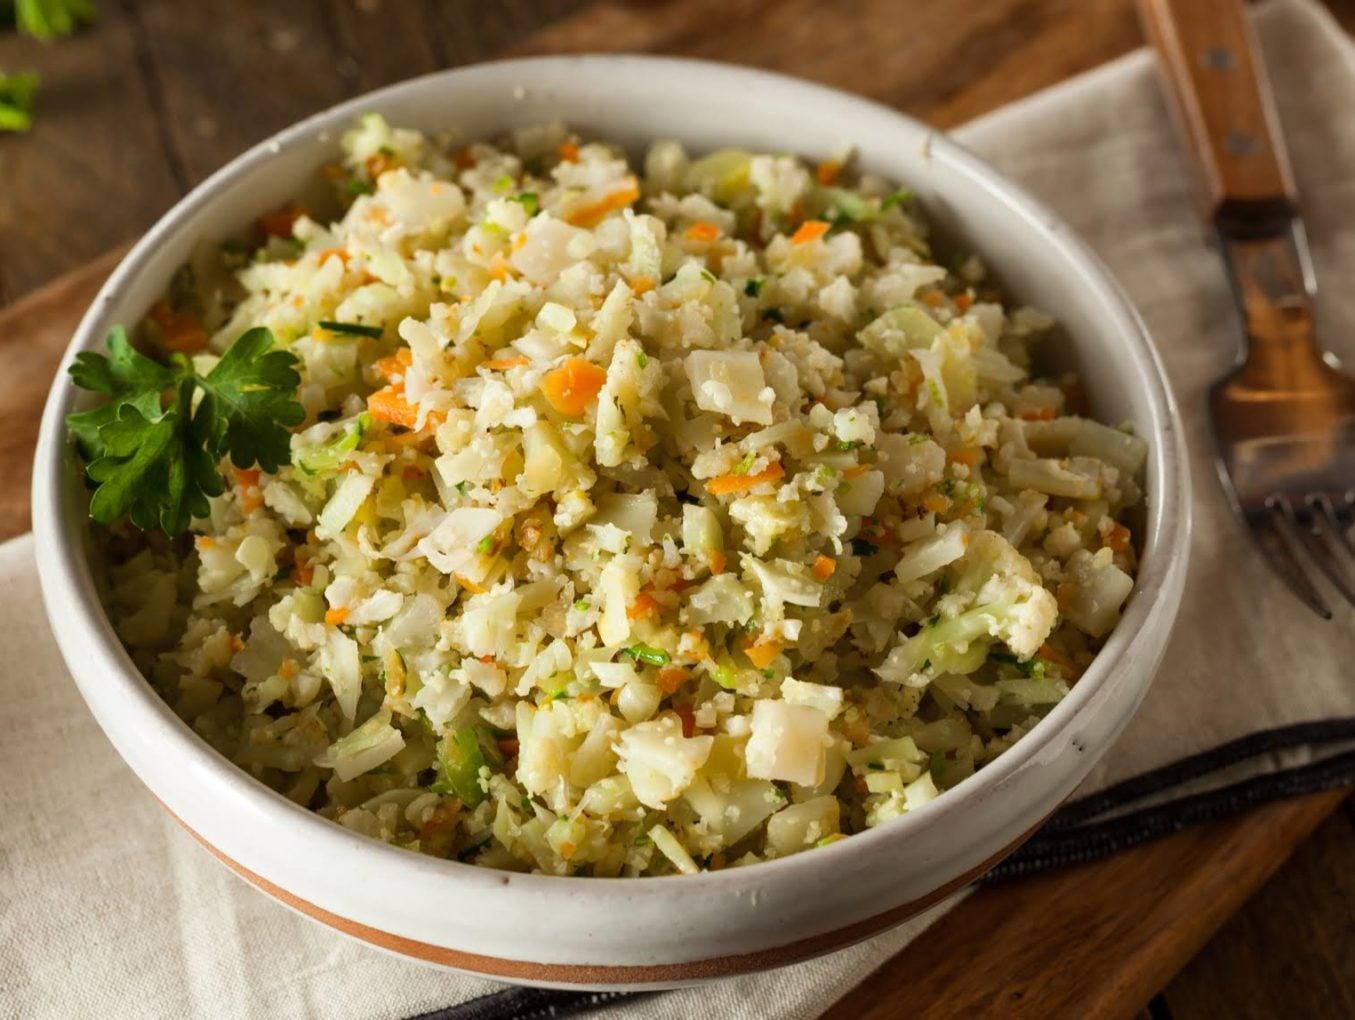 7 Day Indian LCHF & Keto Diet Plan - Rice Alternative Recipes